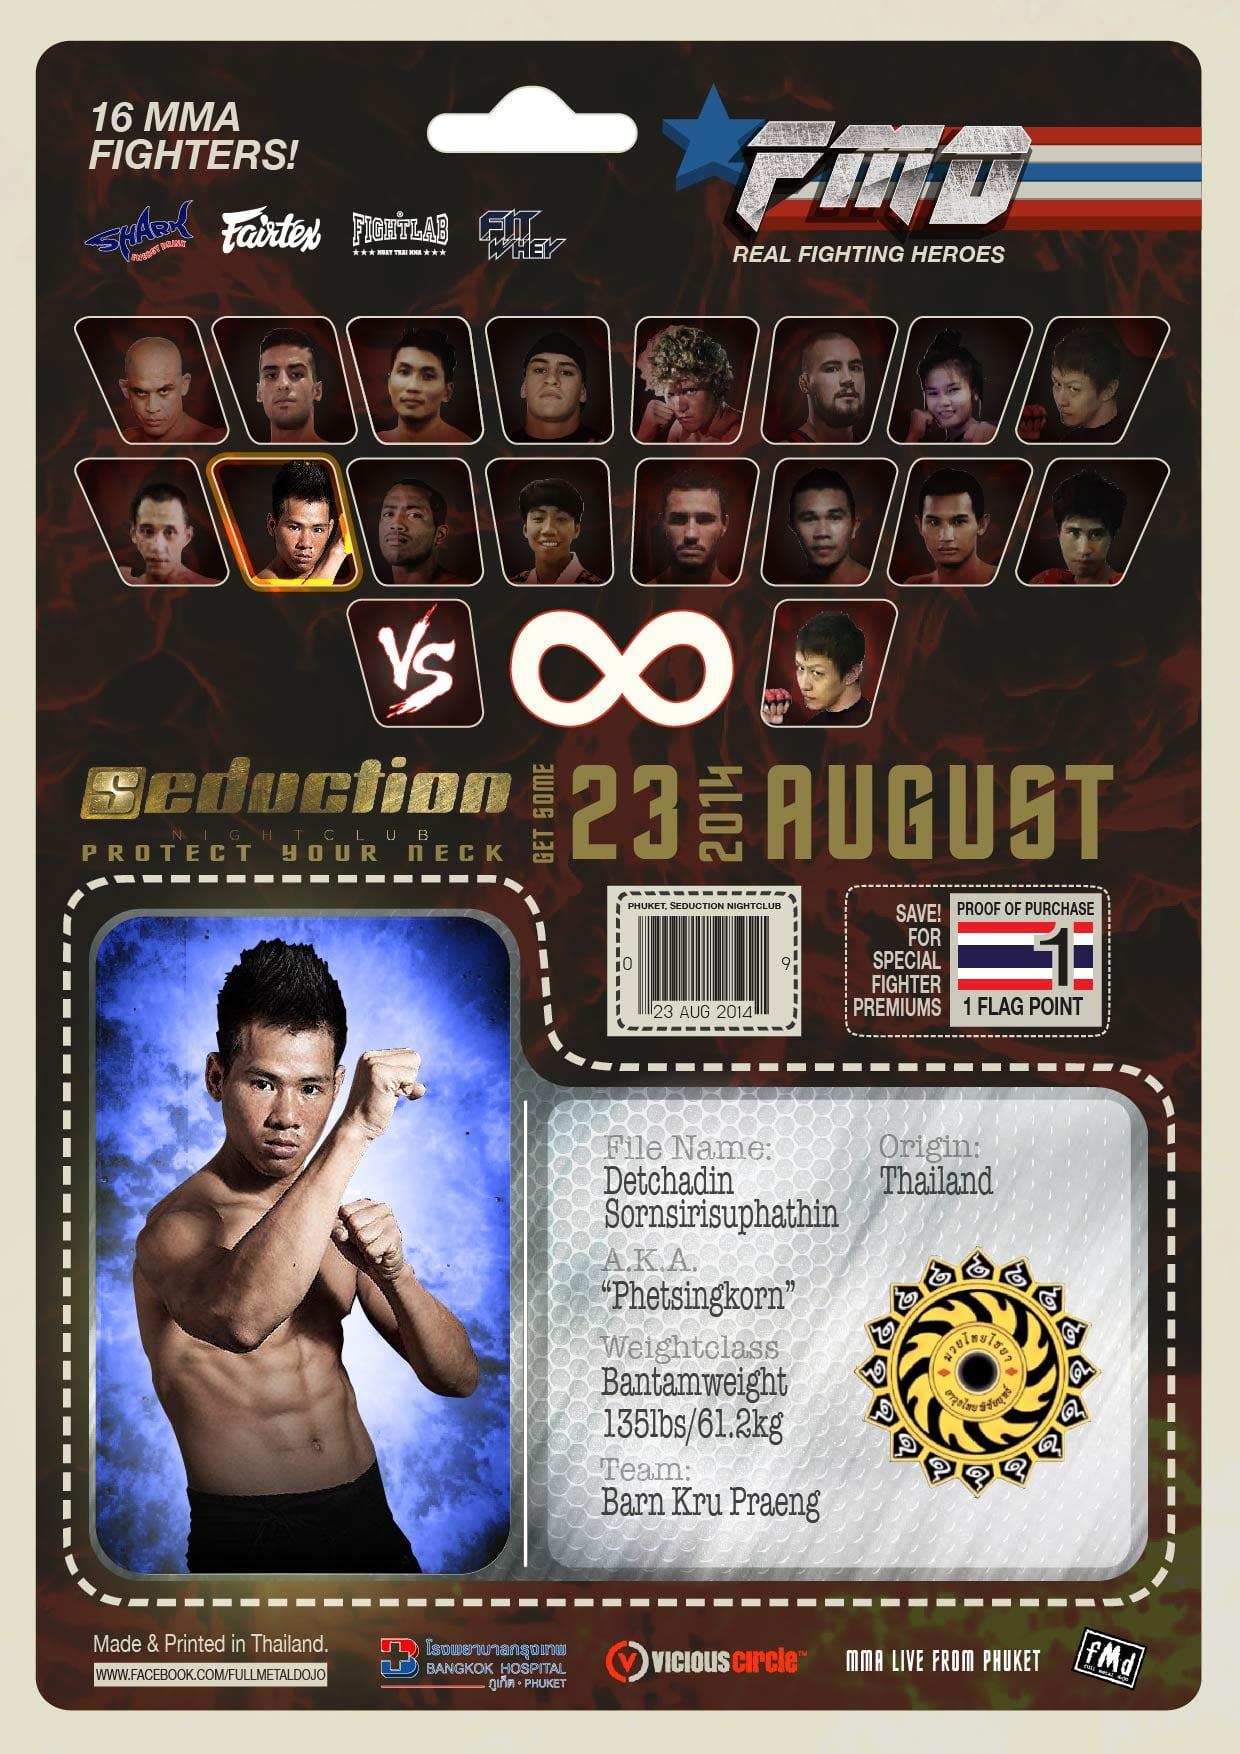 Detchadin 'Phetsingkorn' Sornsirisuphathin FMD2 MMA Fighters